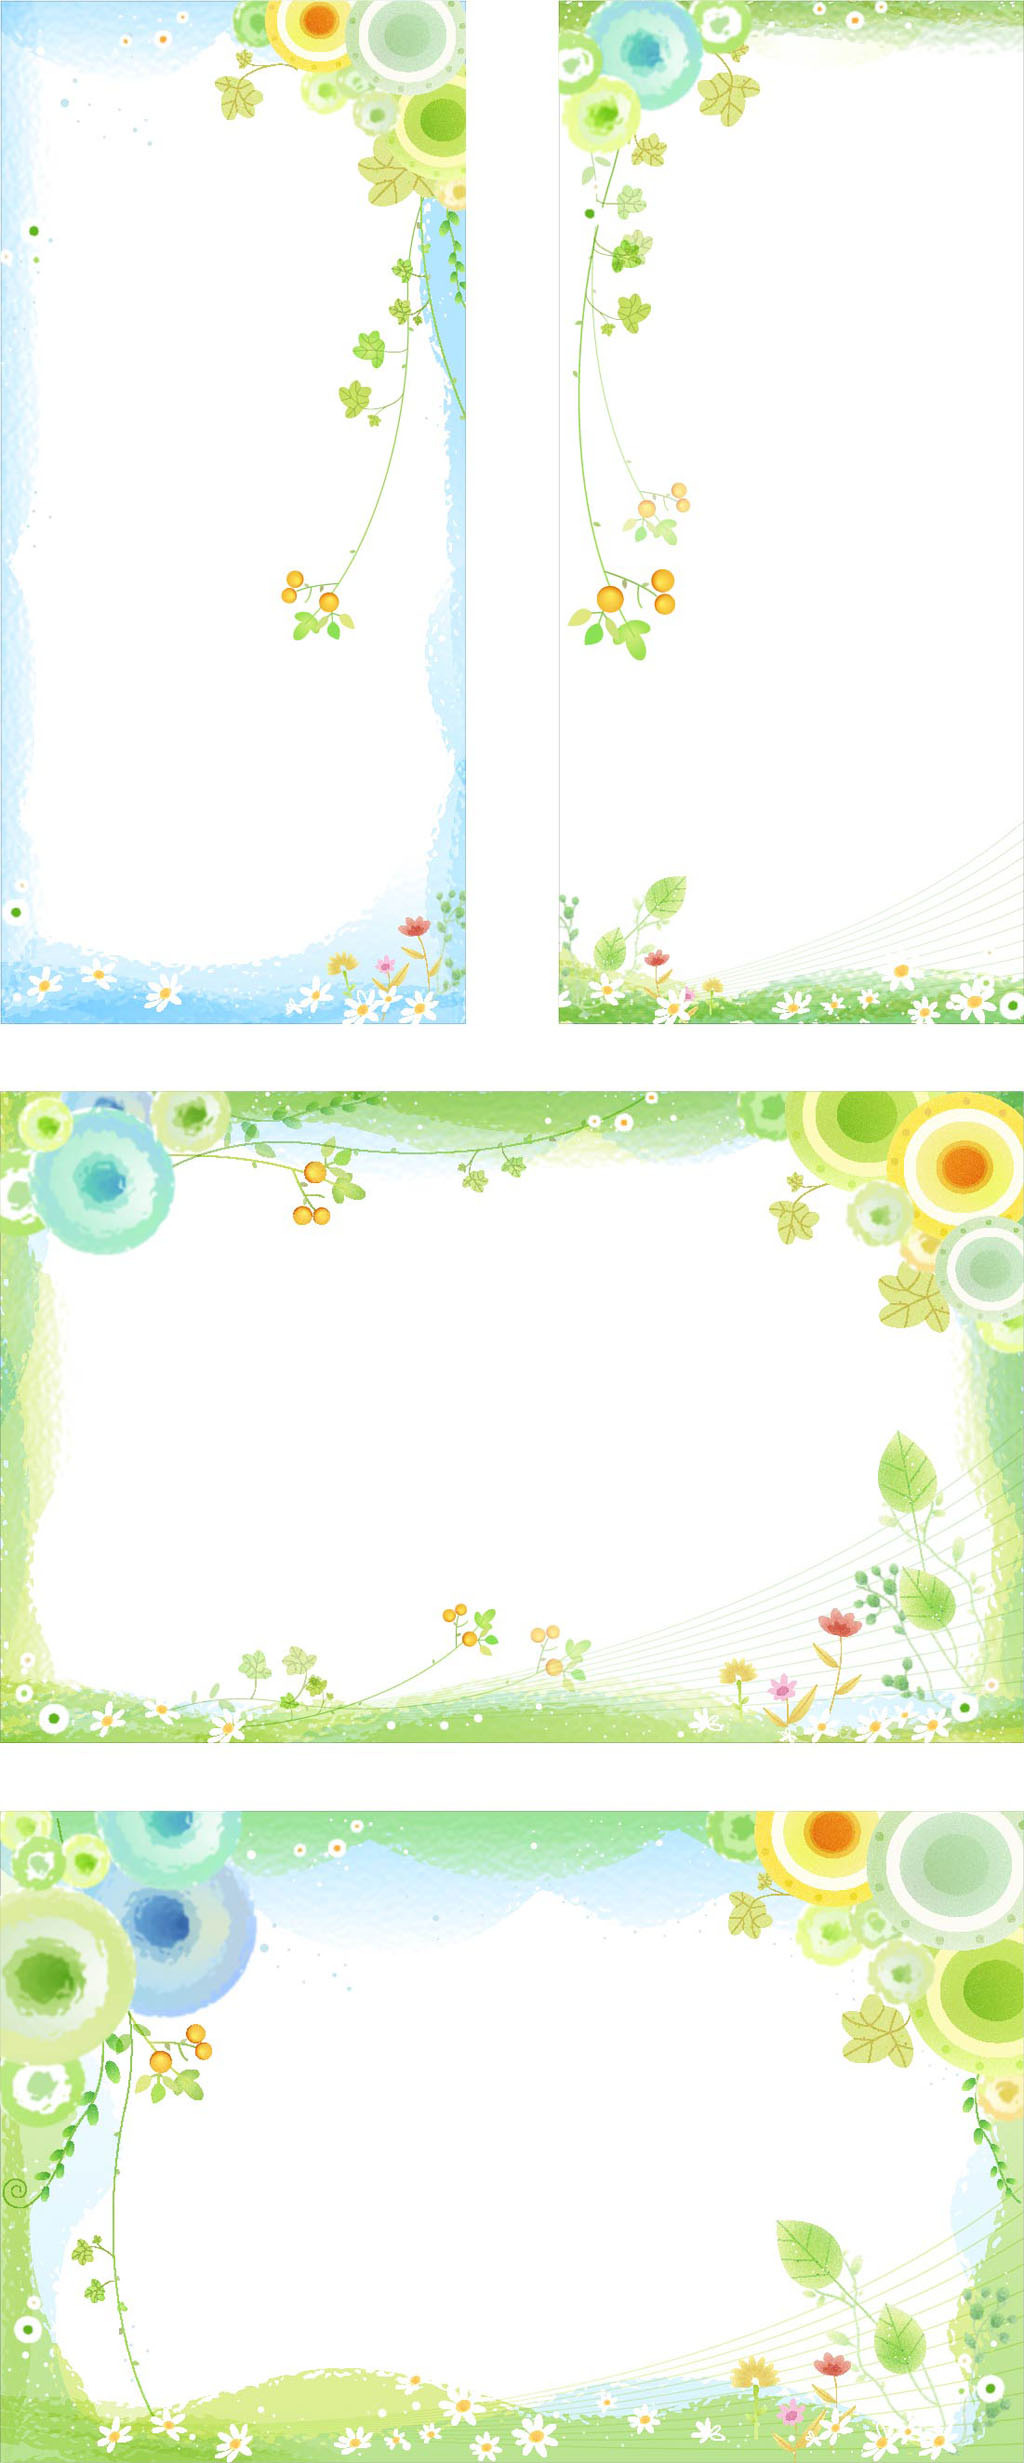 ppt 背景 背景图片 边框 模板 设计 相框 1024_2463 竖版 竖屏